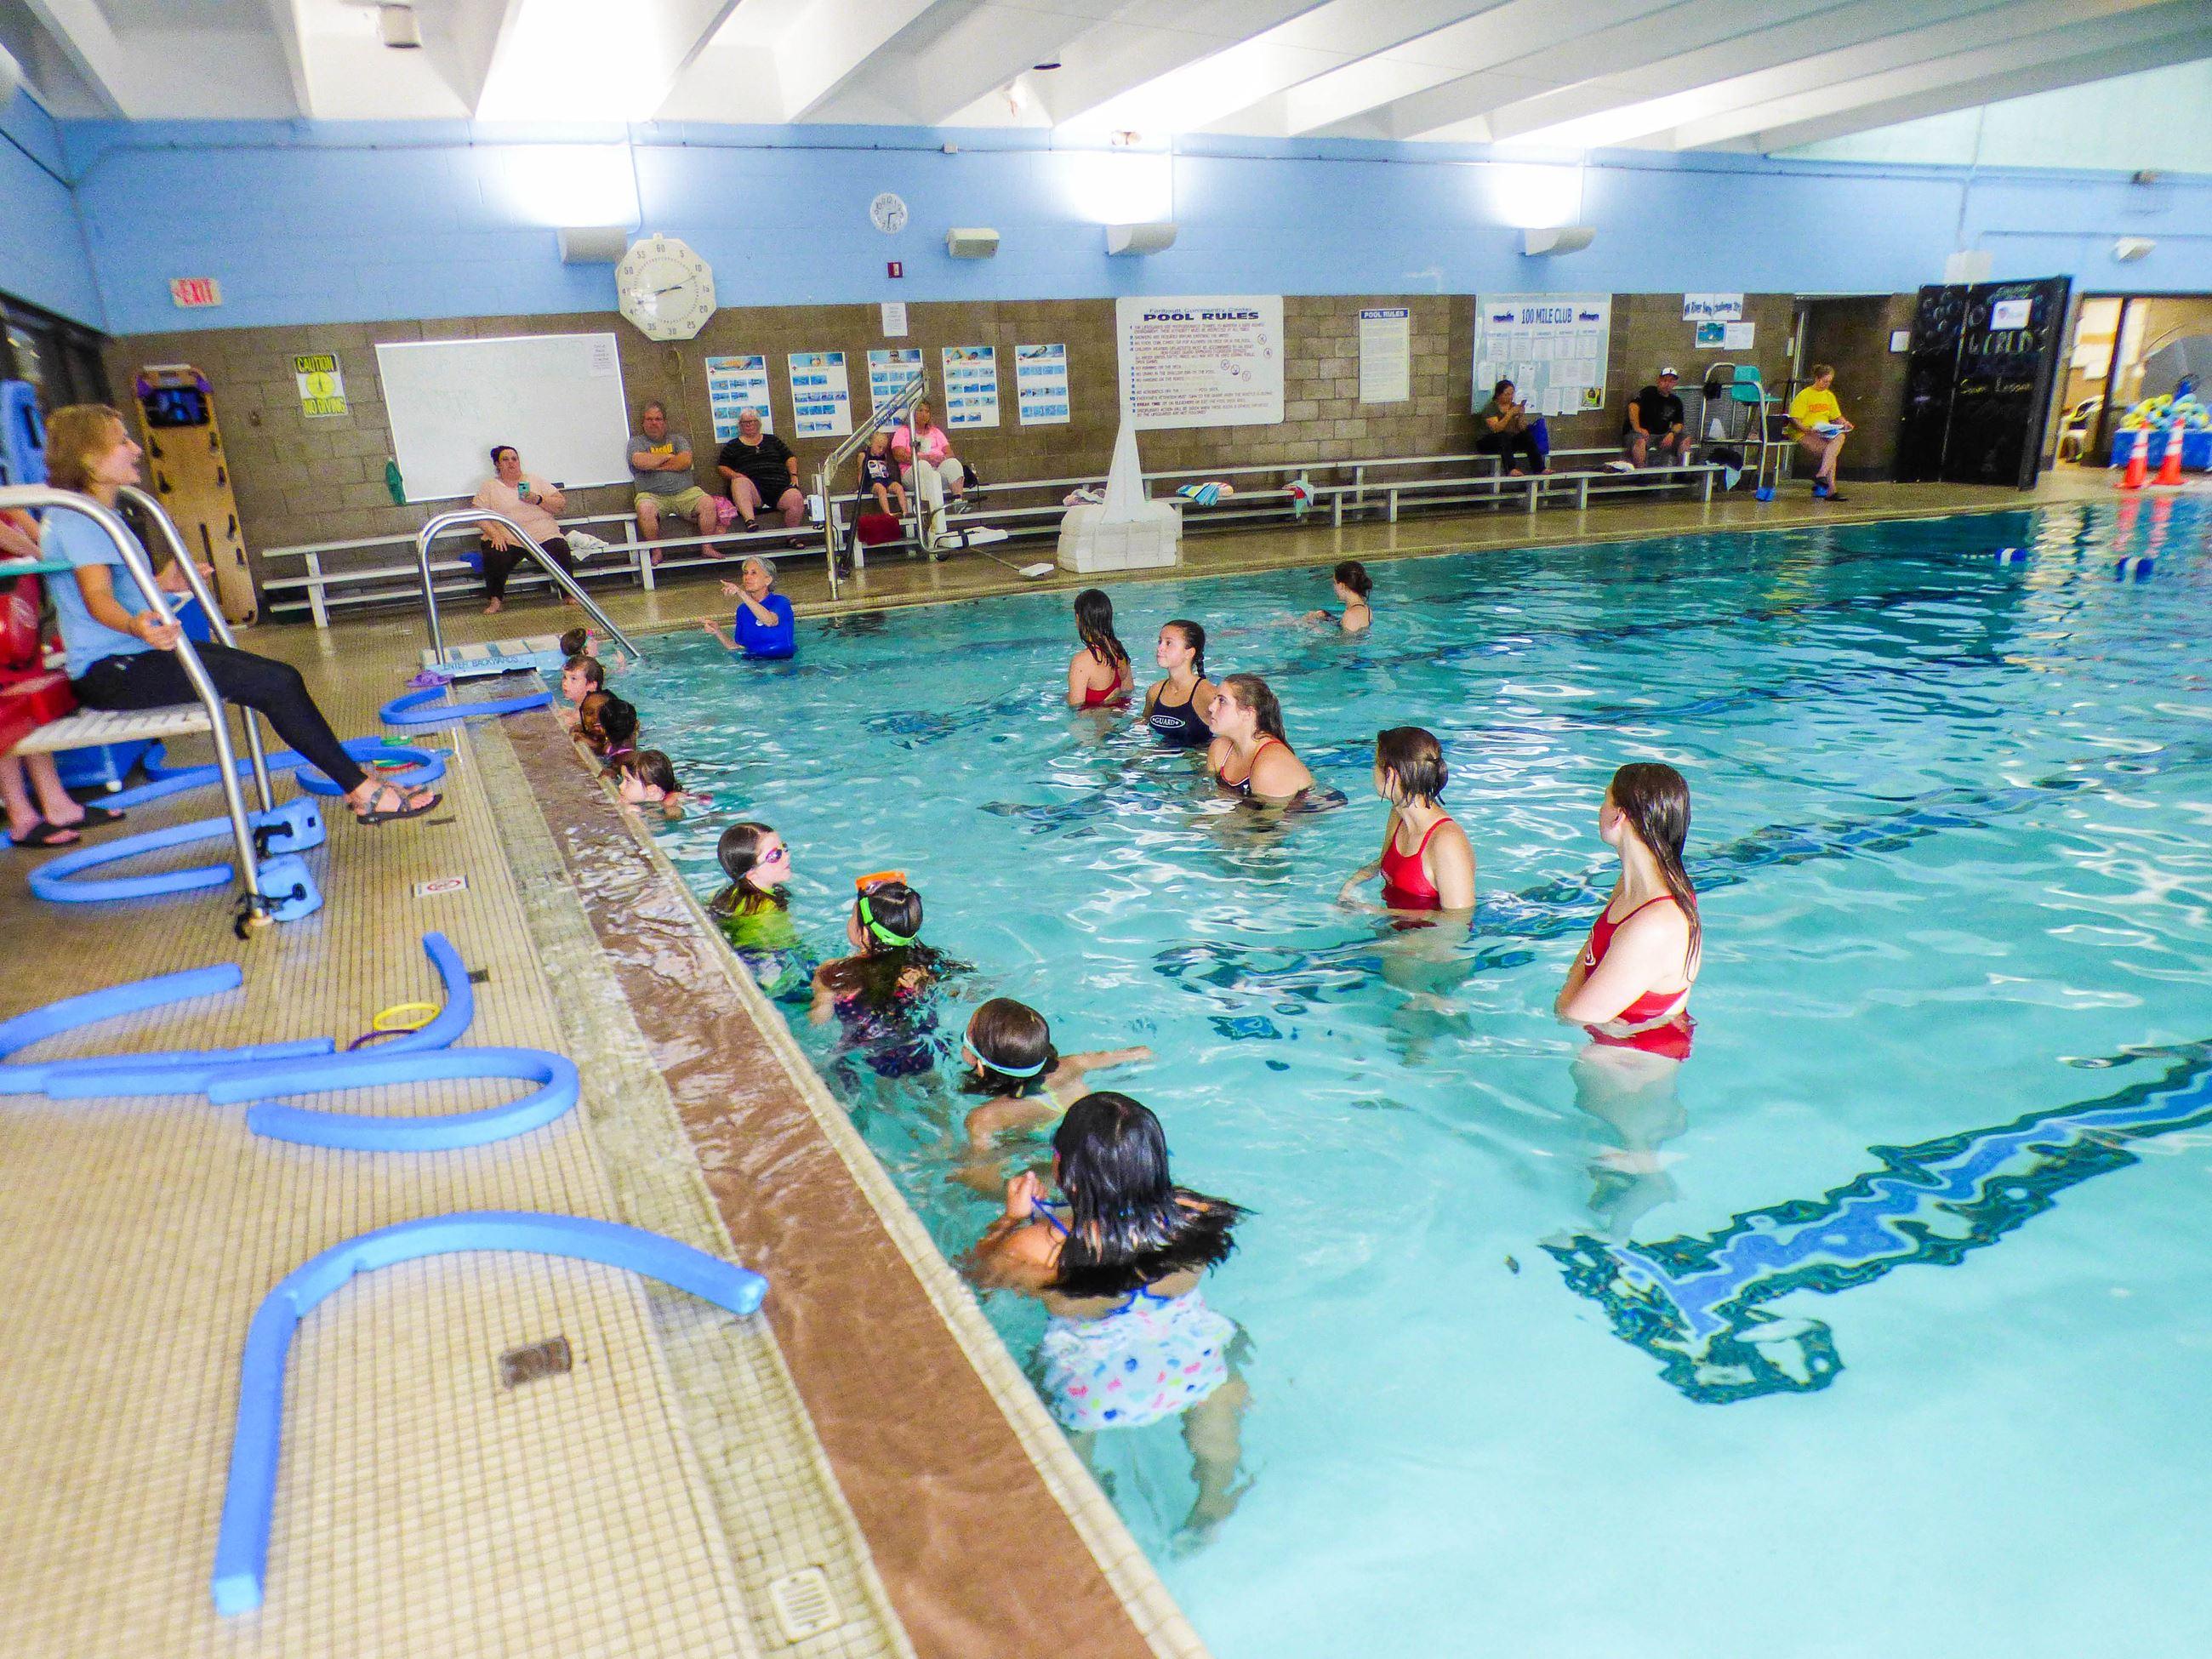 Community Center Pool Faribault Mn